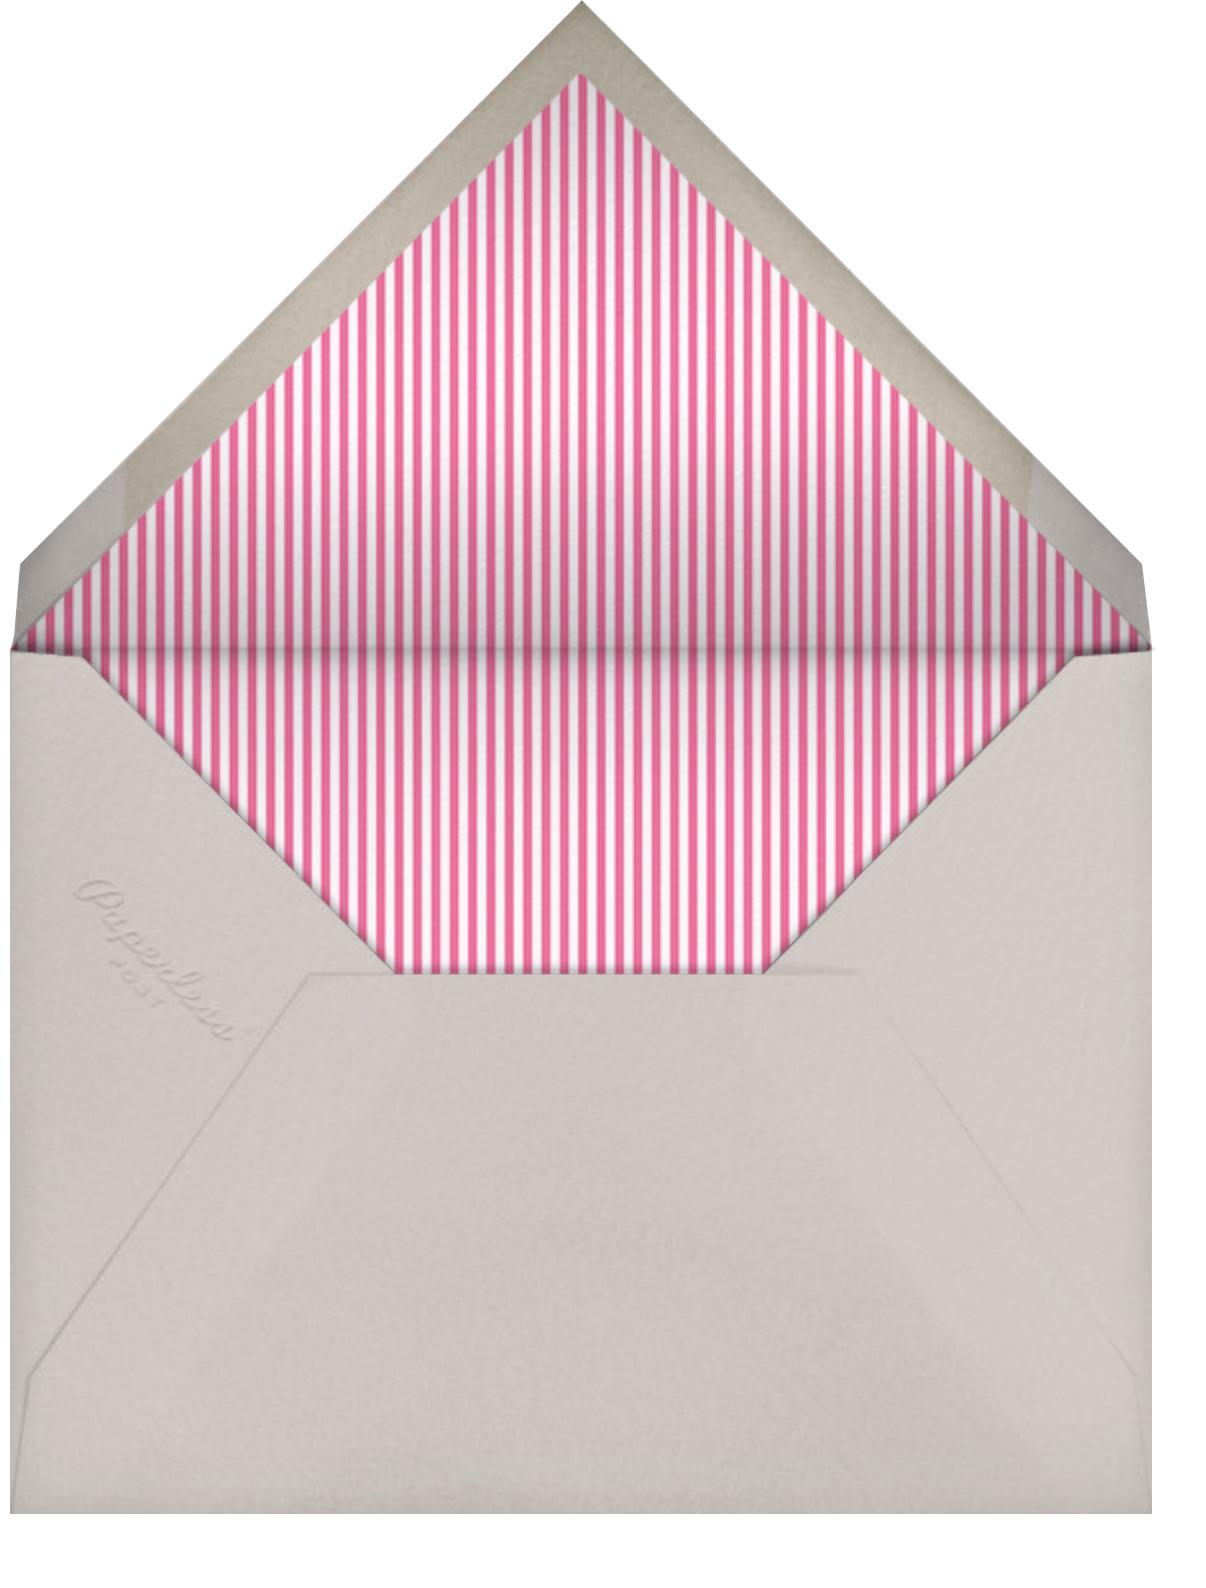 Ellie's Balloon (Photo) - Pink - Little Cube - Envelope